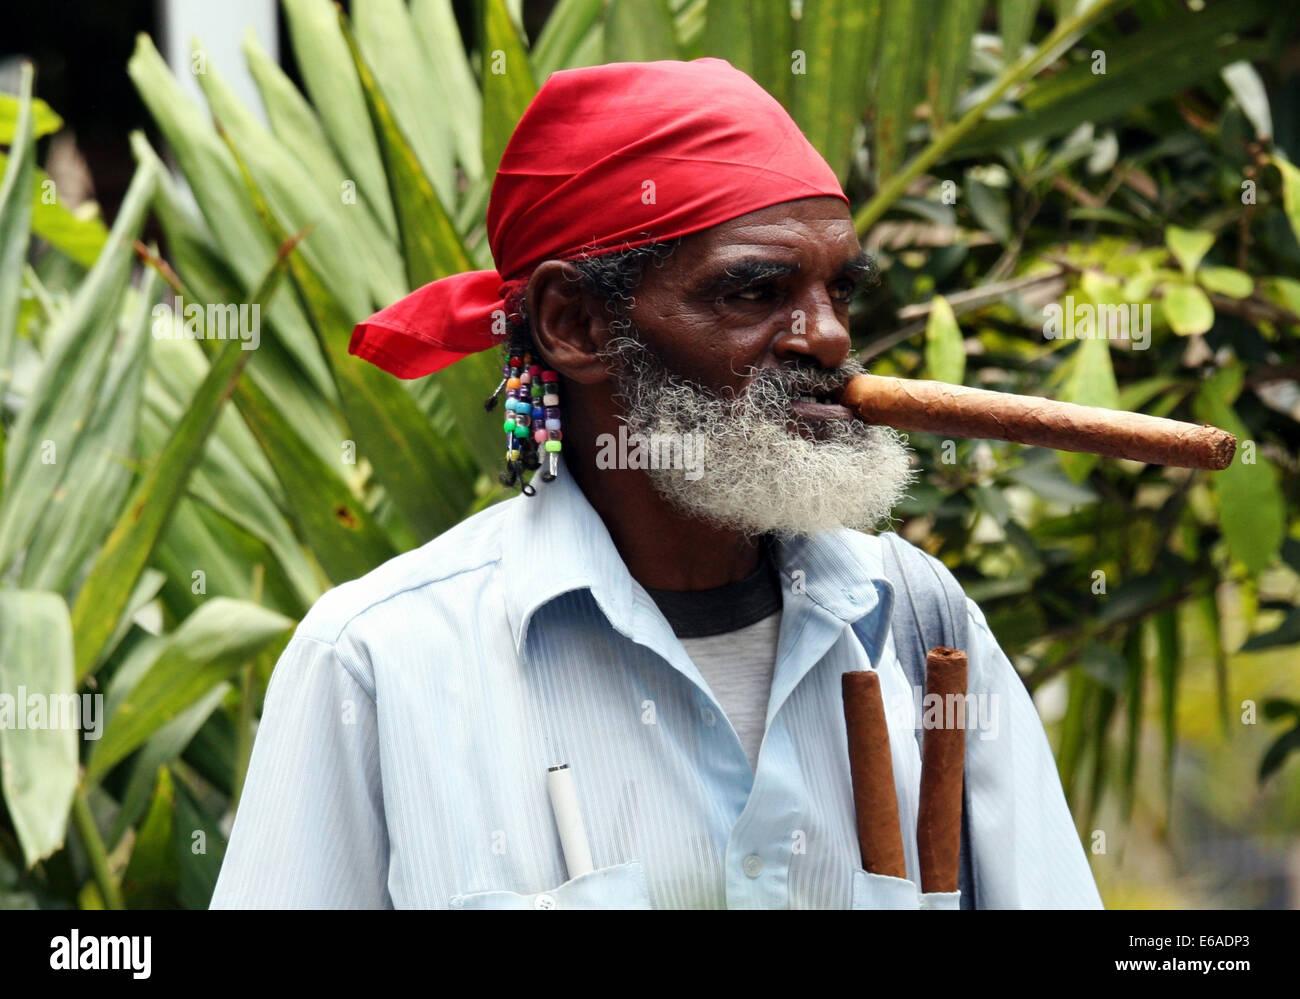 Fumar cigarro,,Cuba,etnia cubana Imagen De Stock